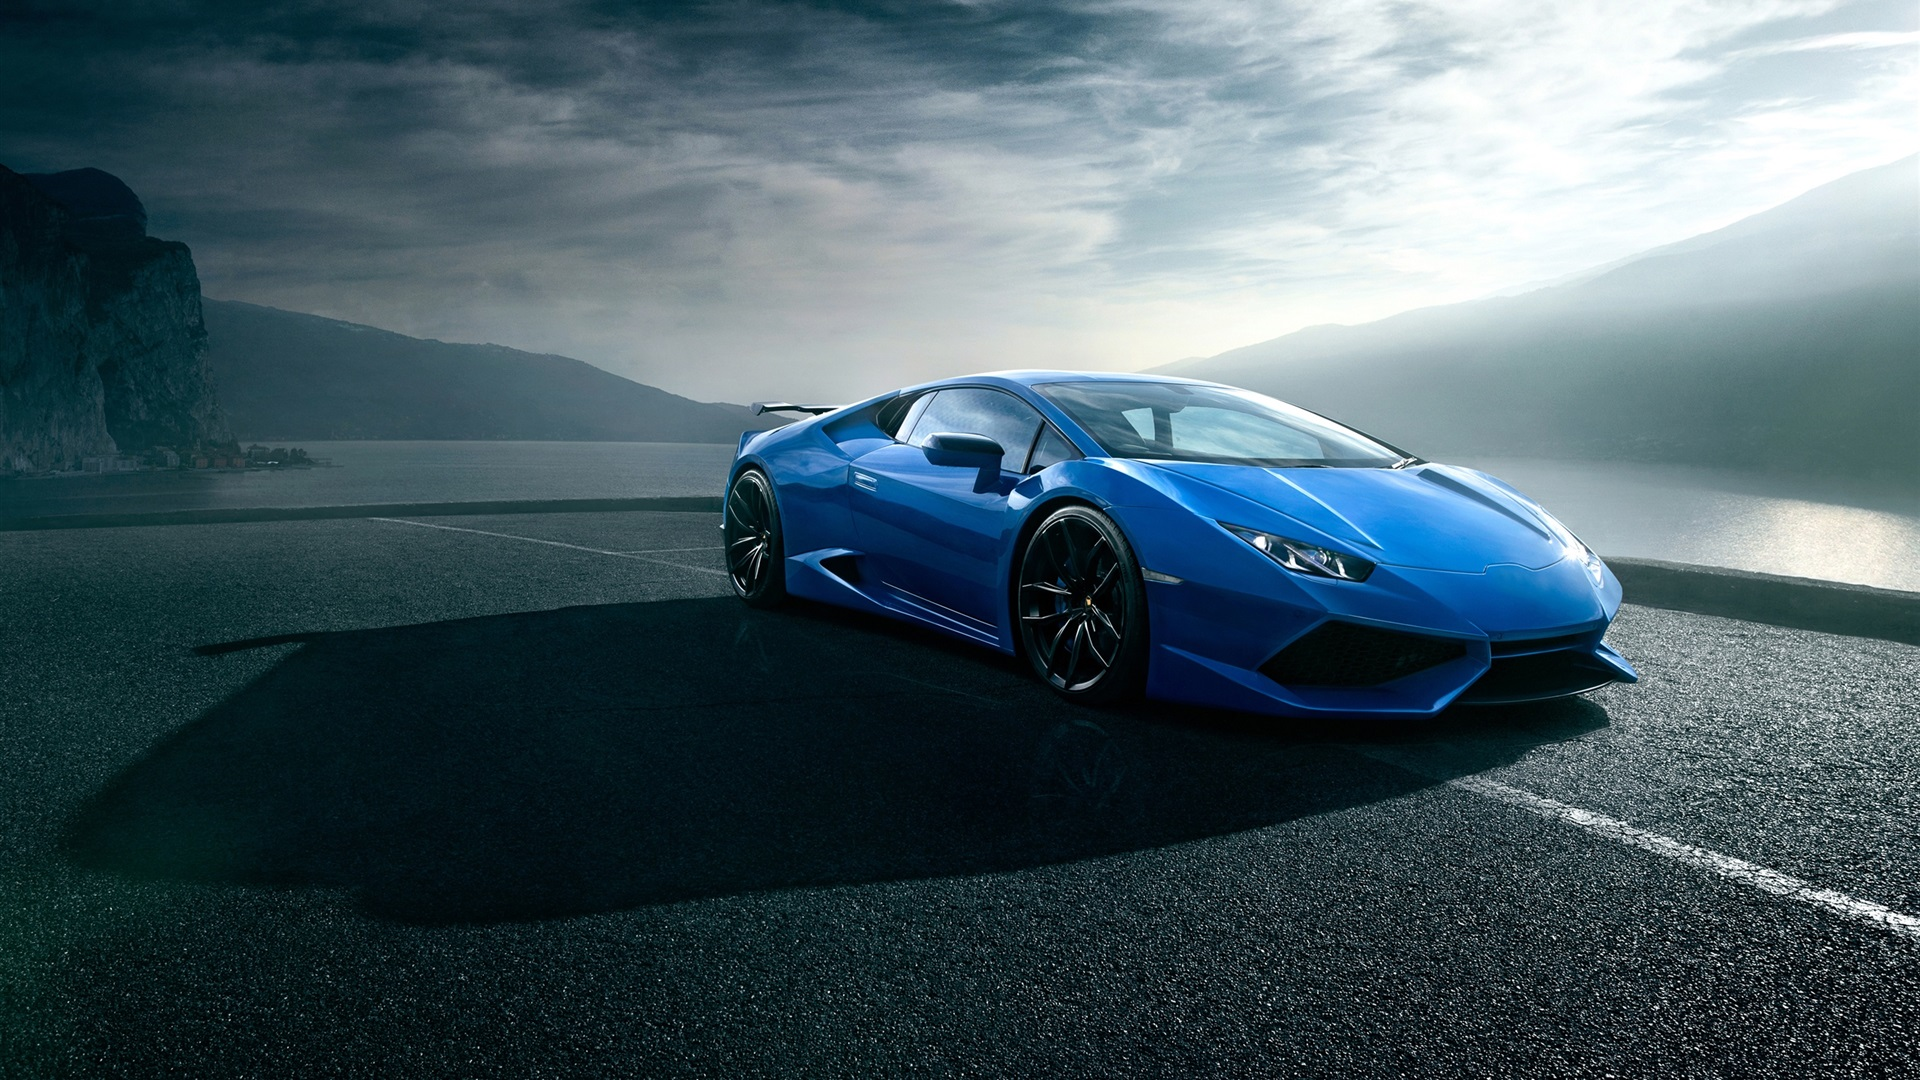 Wallpaper Lamborghini Huracan Blue Luxury Supercar Road